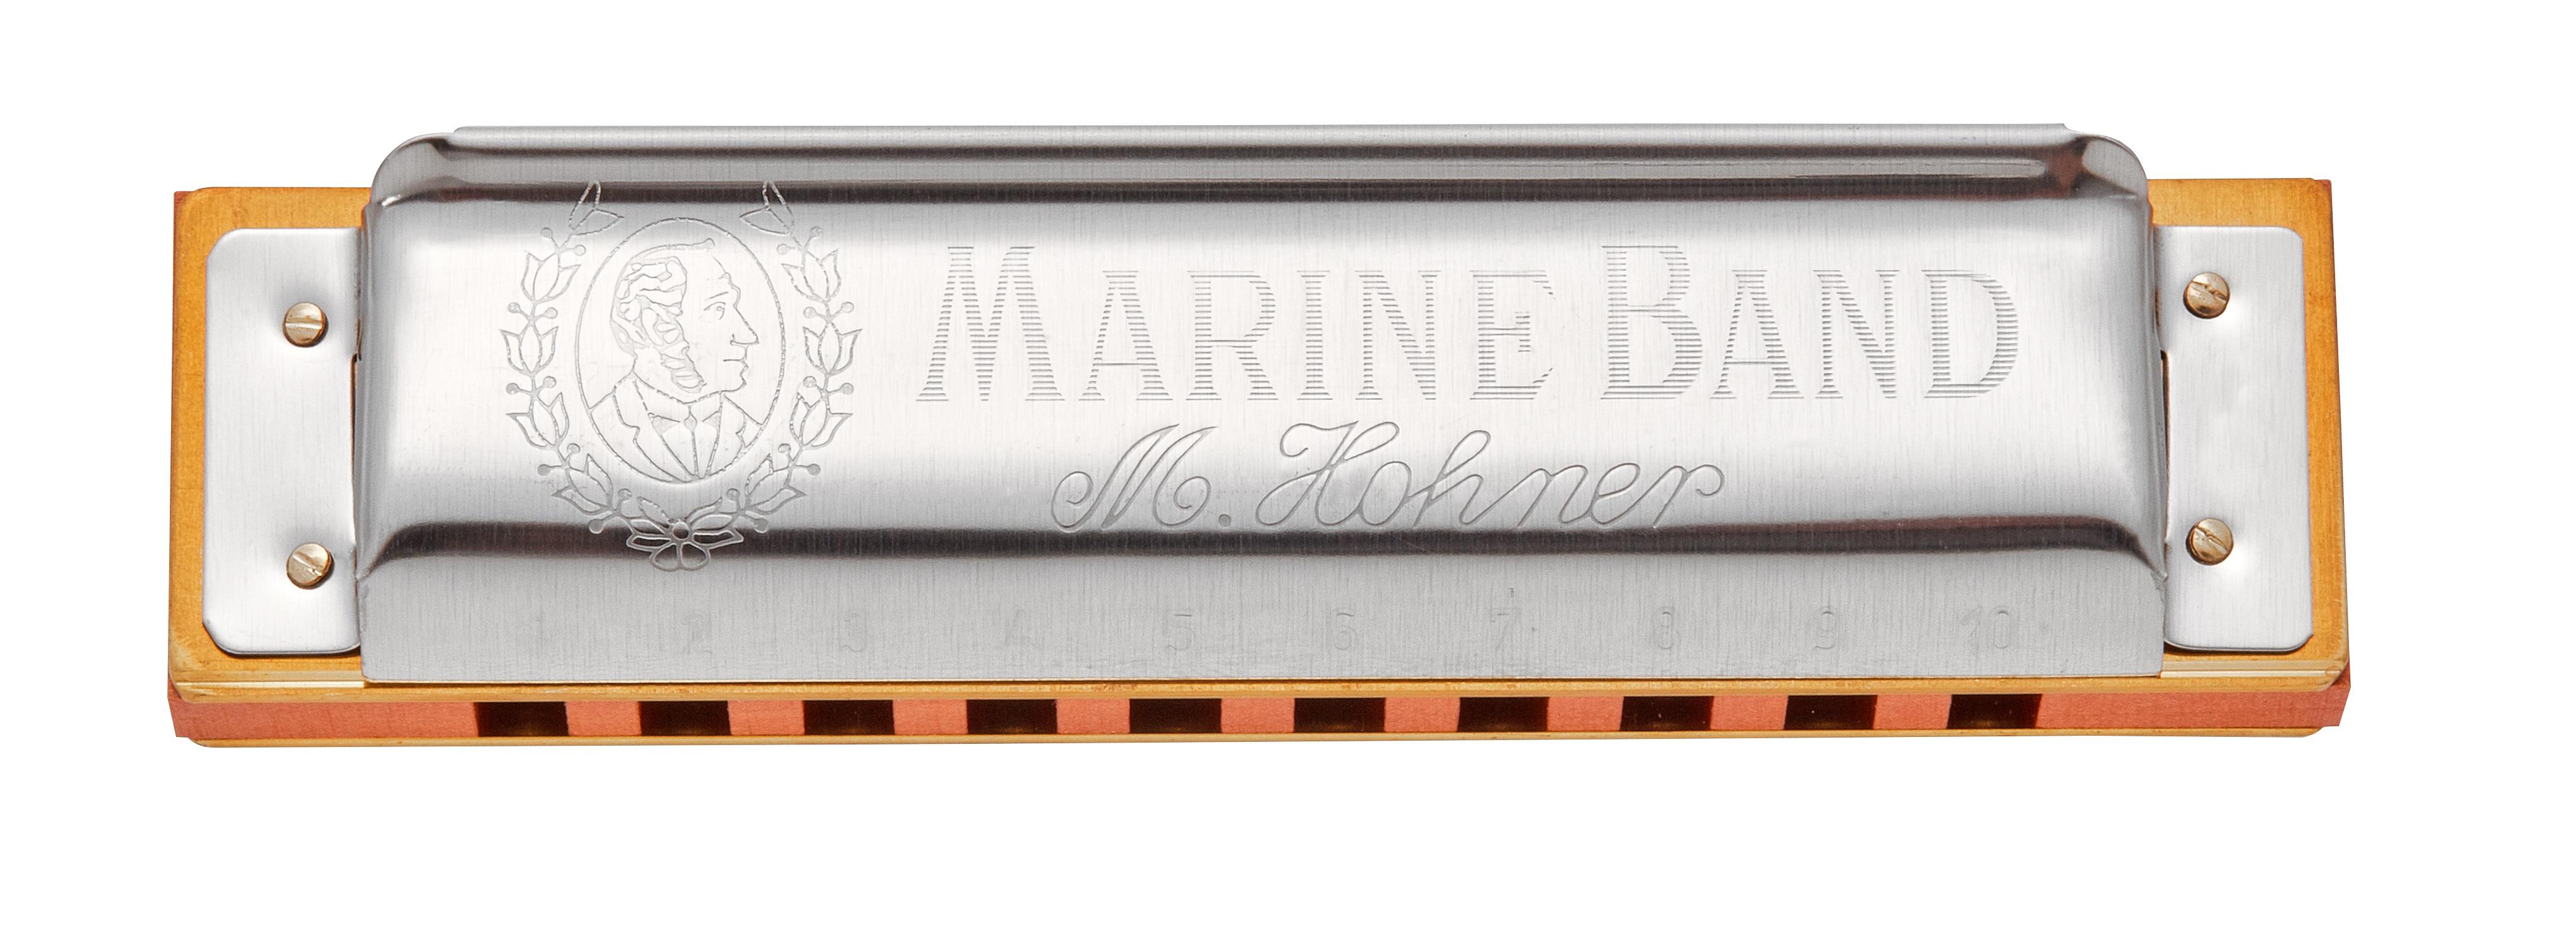 Hohner Marine Band 1896 F#-natural minor